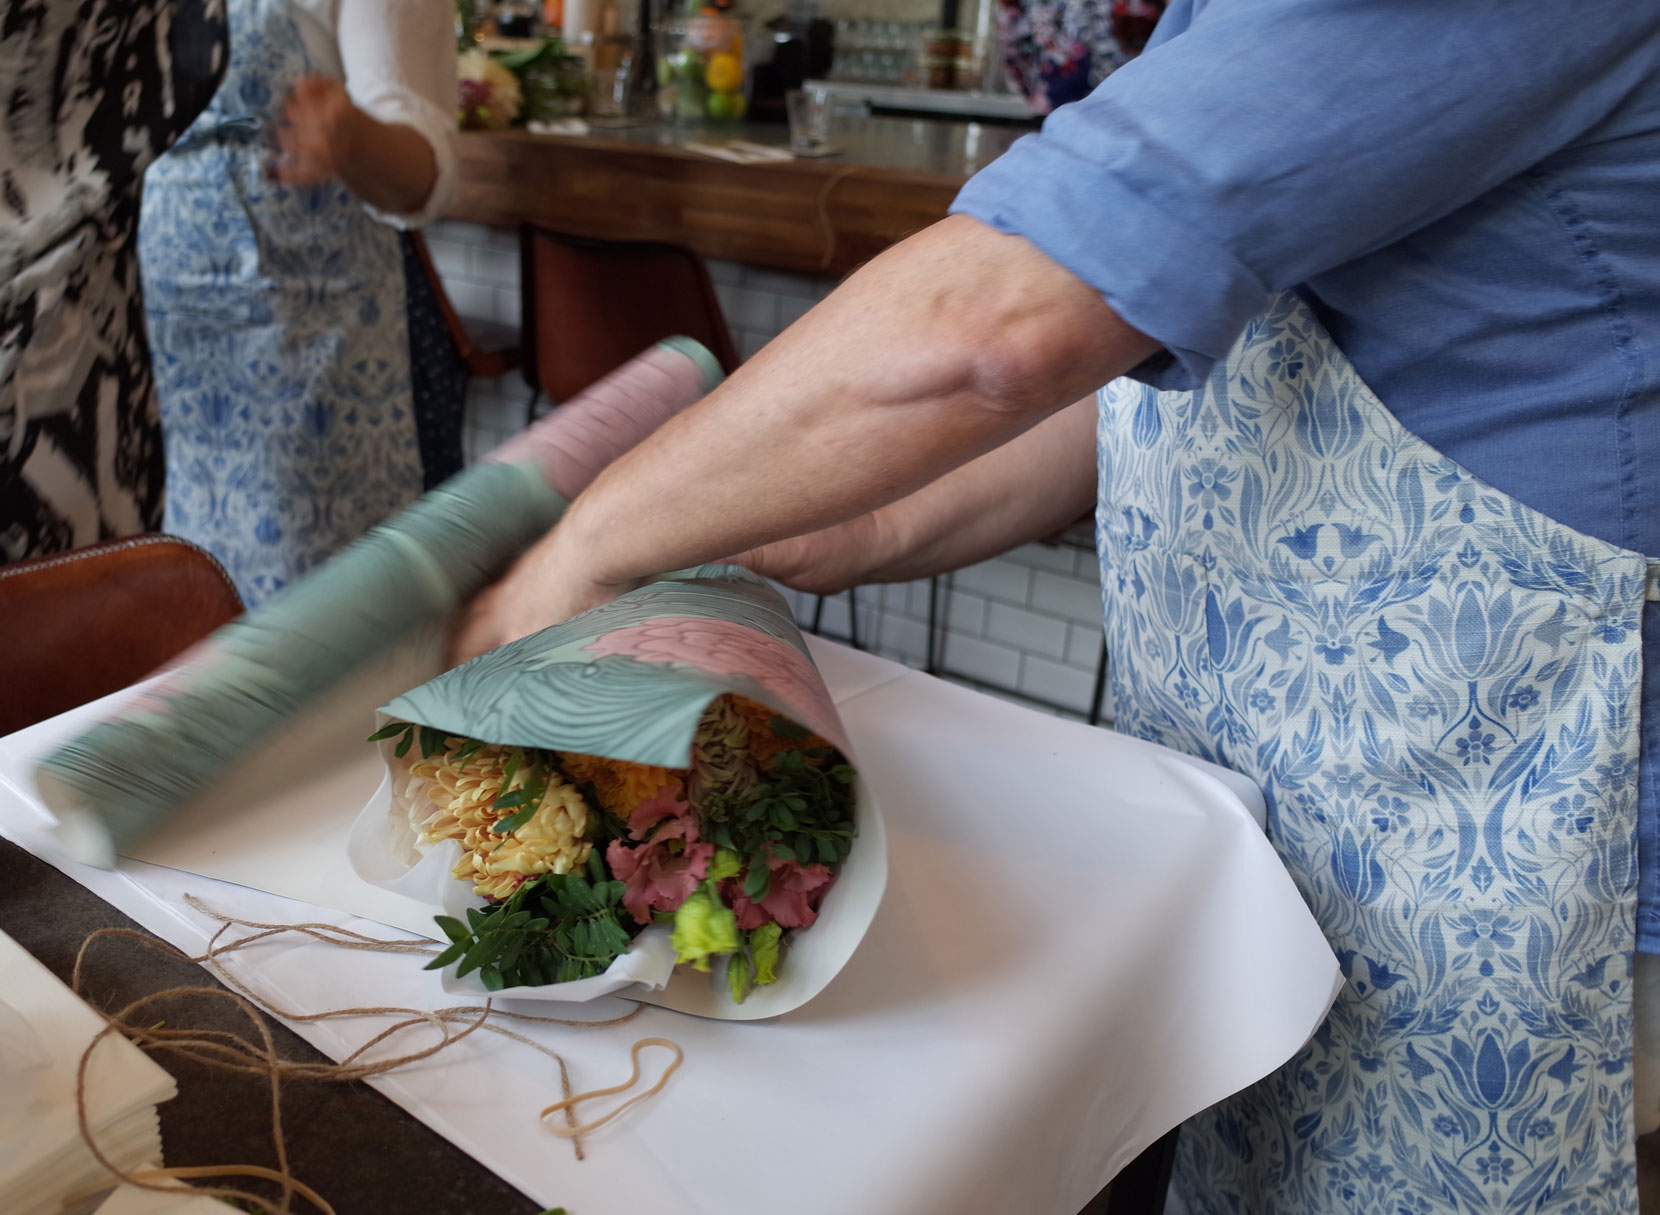 tapetfrukost-blomsterbinderi-björn-nilsson-midbec